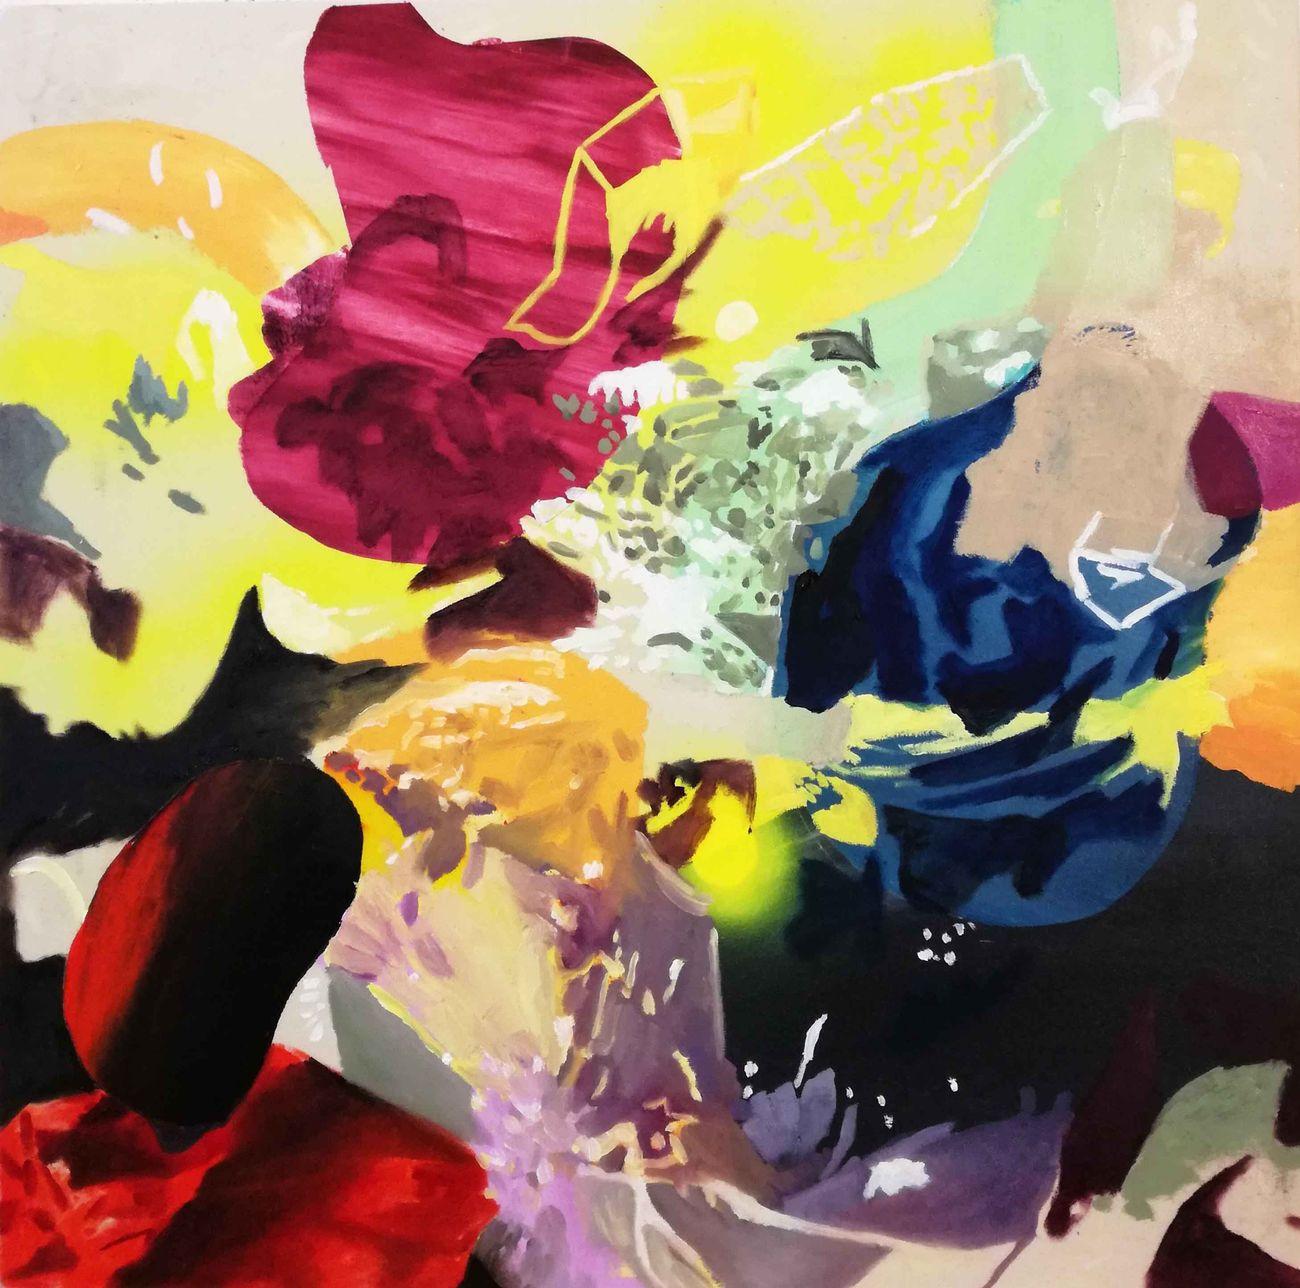 Zanbagh Lotfi, Tu tienimi (I'm just killing time), 2019, olio su tavola, 45x45 cm